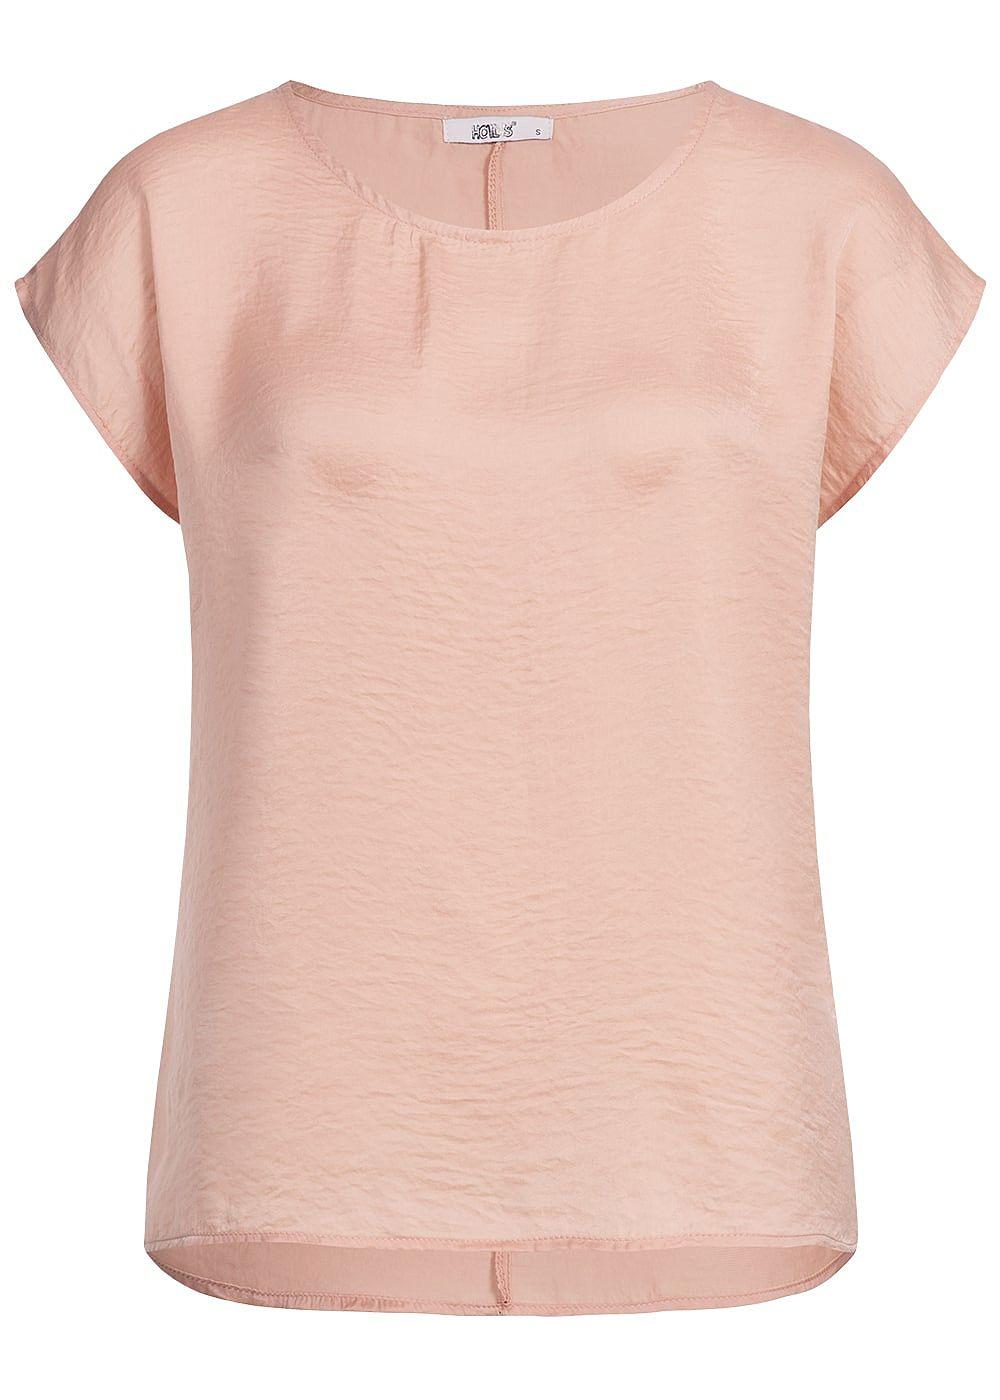 8597f89687271f Hailys Damen Blusen Top rosa - 77onlineshop